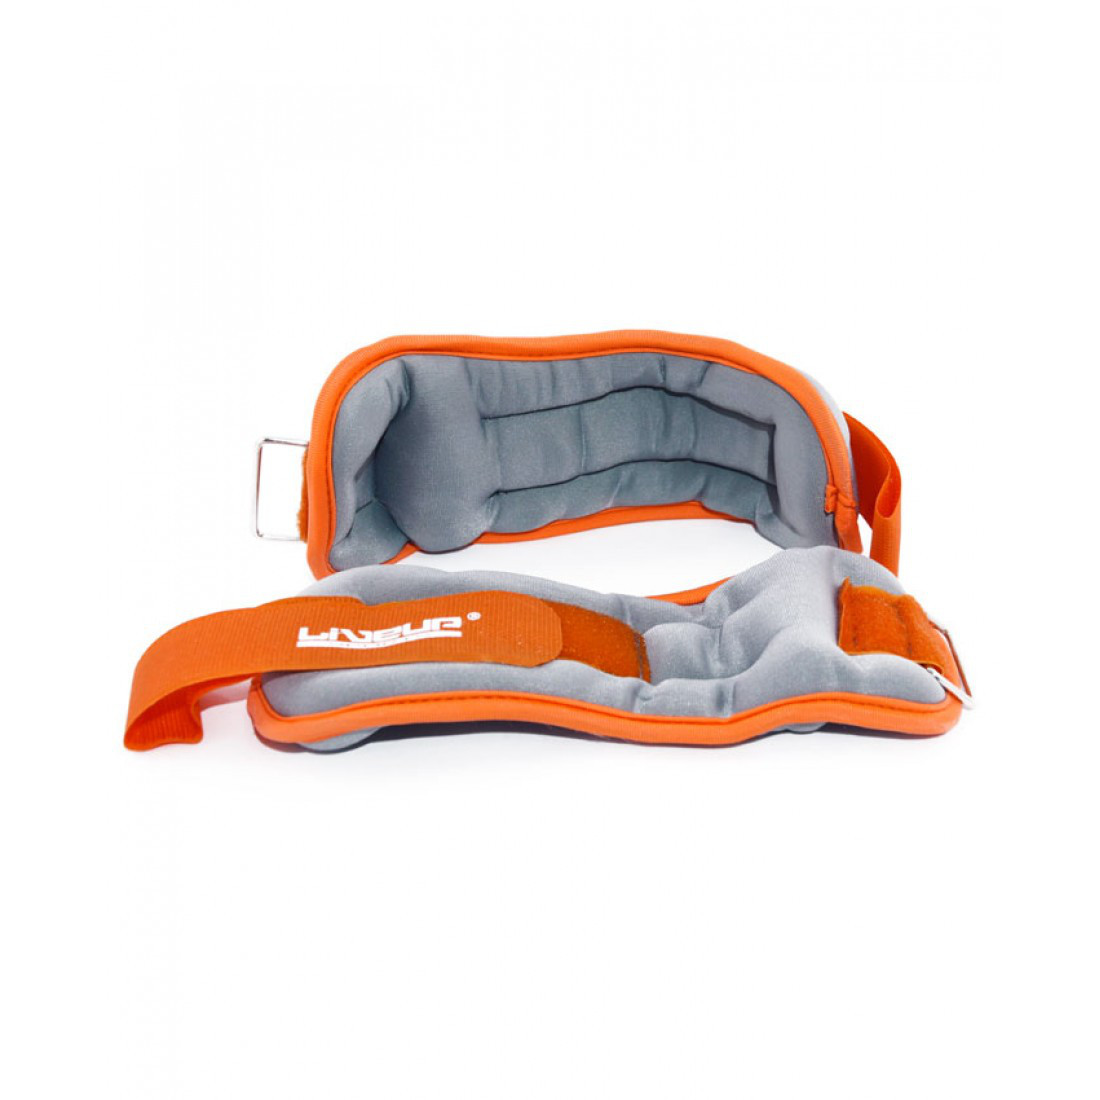 Утяжелители-манжеты для рук и ног LiveUp Wrist/Ankle Weight 2шт х 0,5 кг